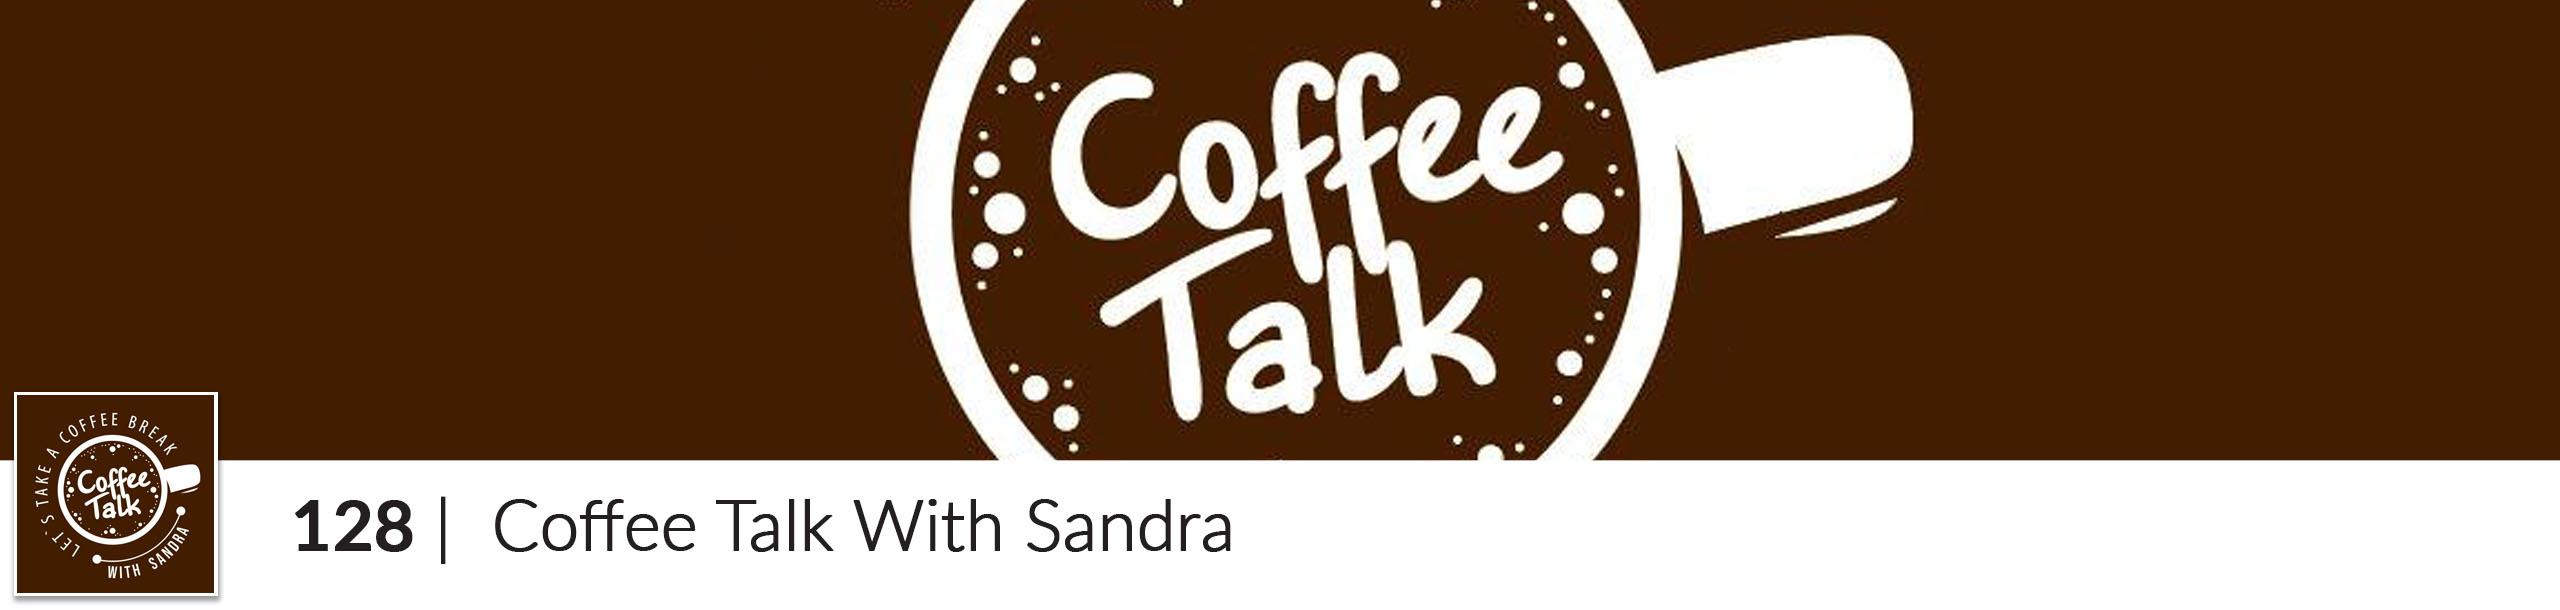 coffee_talk_header1-1